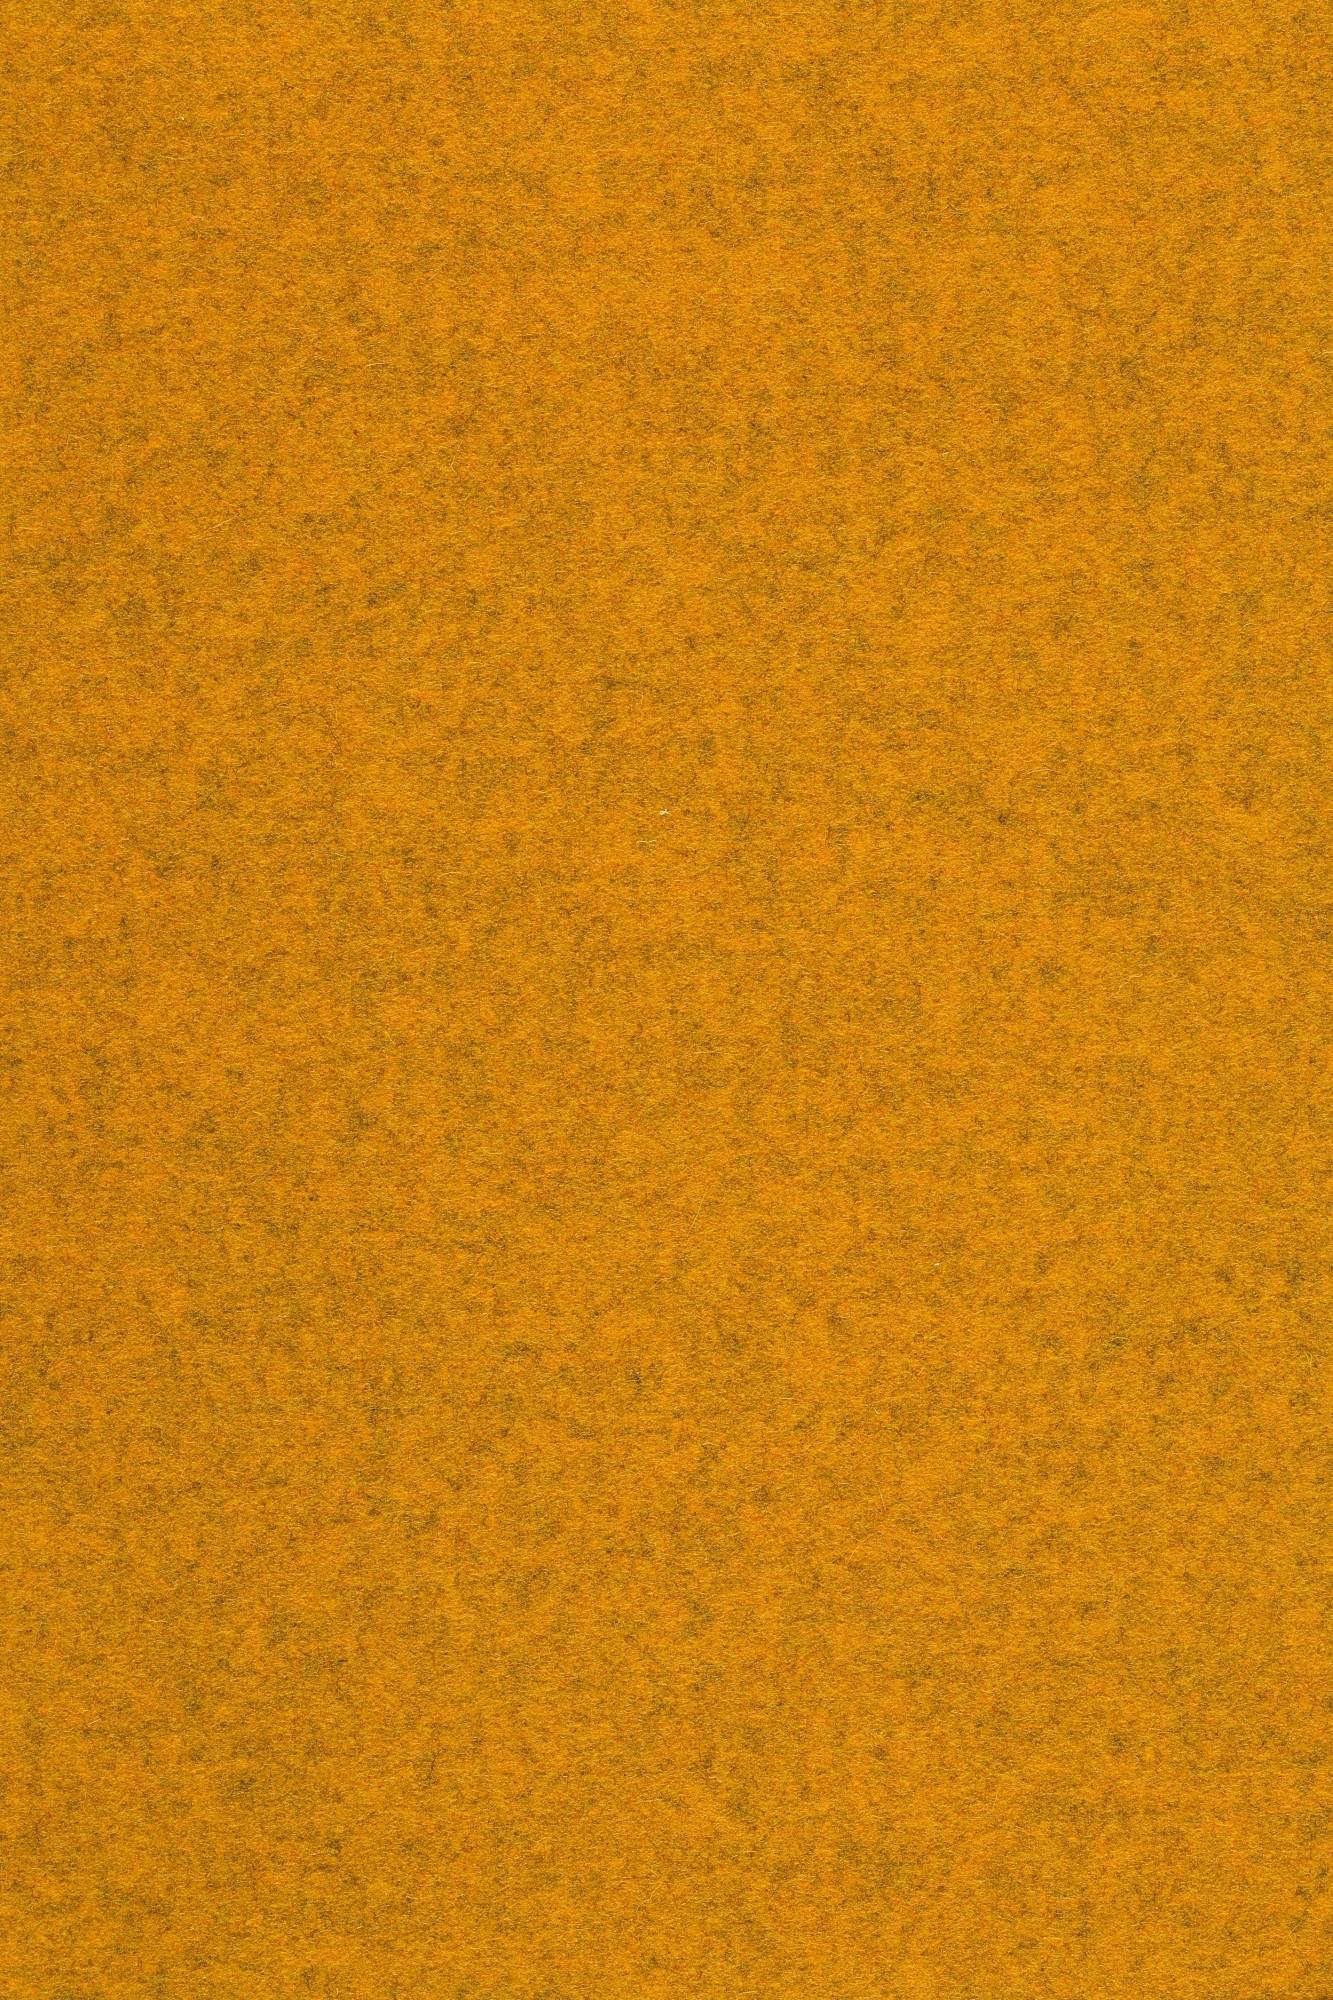 #BE780D22345012 Divina Melange 2 Fabrics Stoffen & Lederen Zitmeubelen JORI Meest recente Design Meubelen Wervik 1951 pic 133320001951 Ontwerp